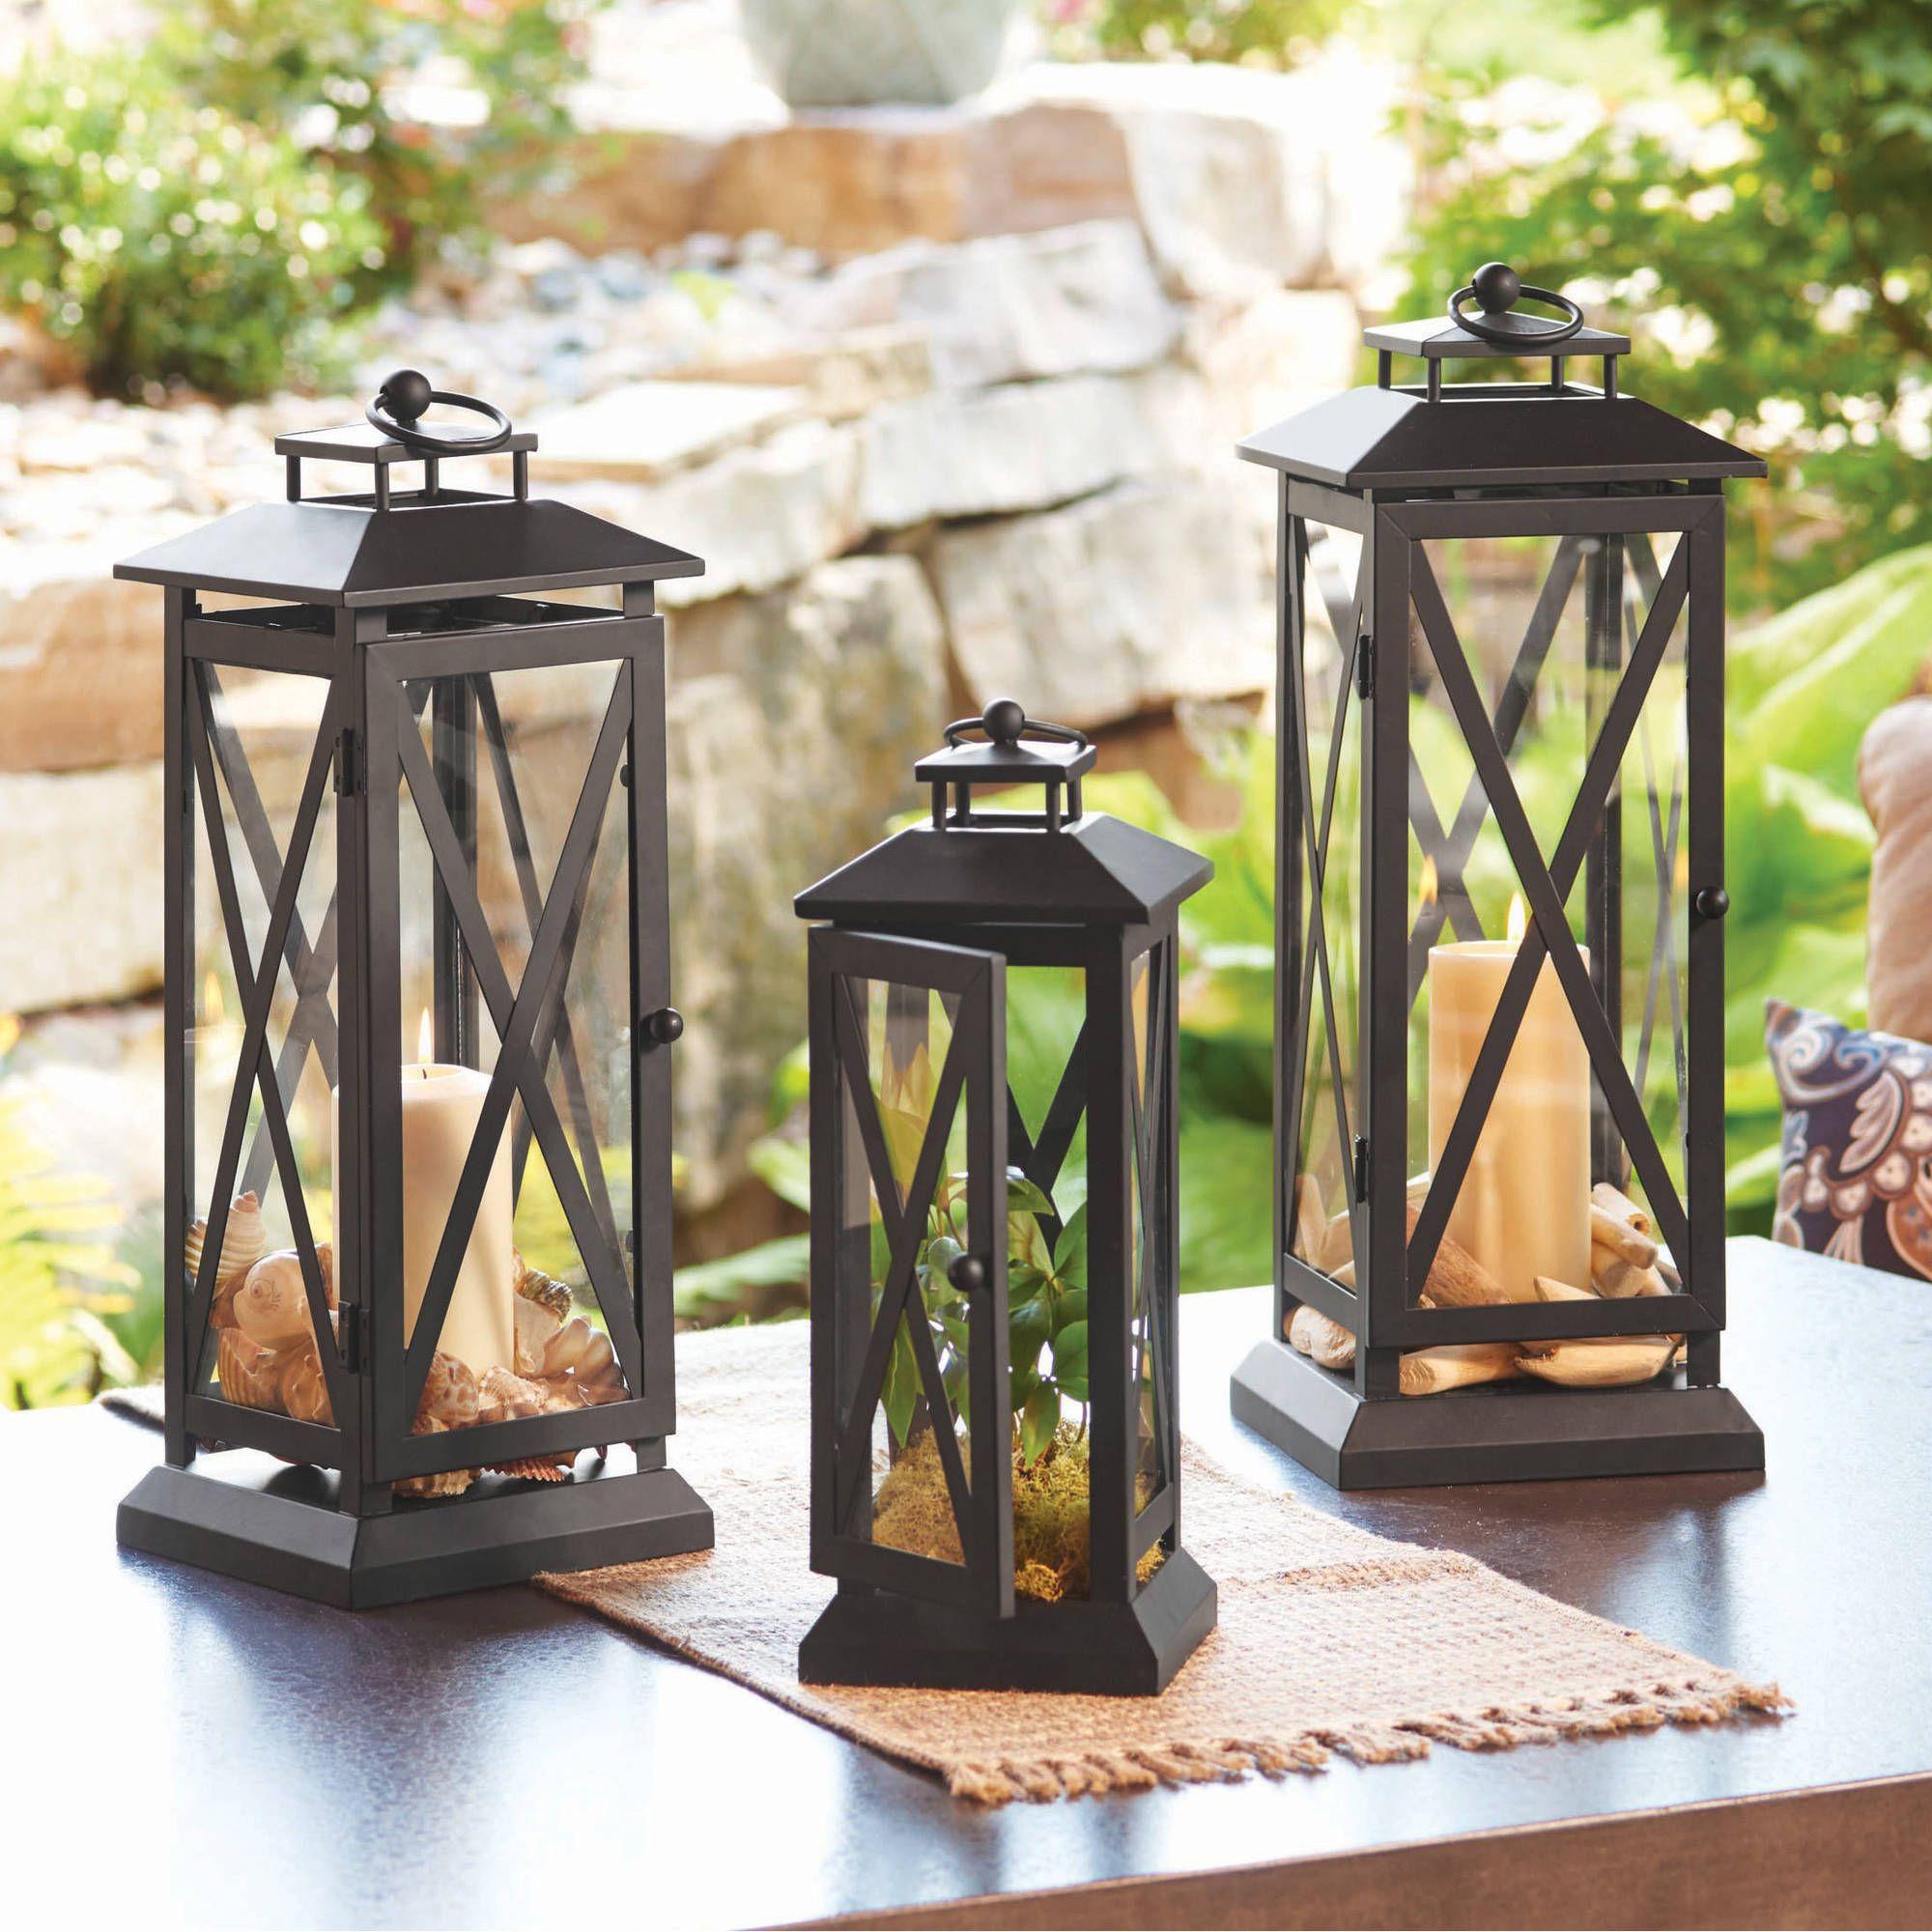 cc4e34030ec570d30a9fb9911c6af40d - Better Homes And Gardens Farmhouse Large Lantern Rustic Finish